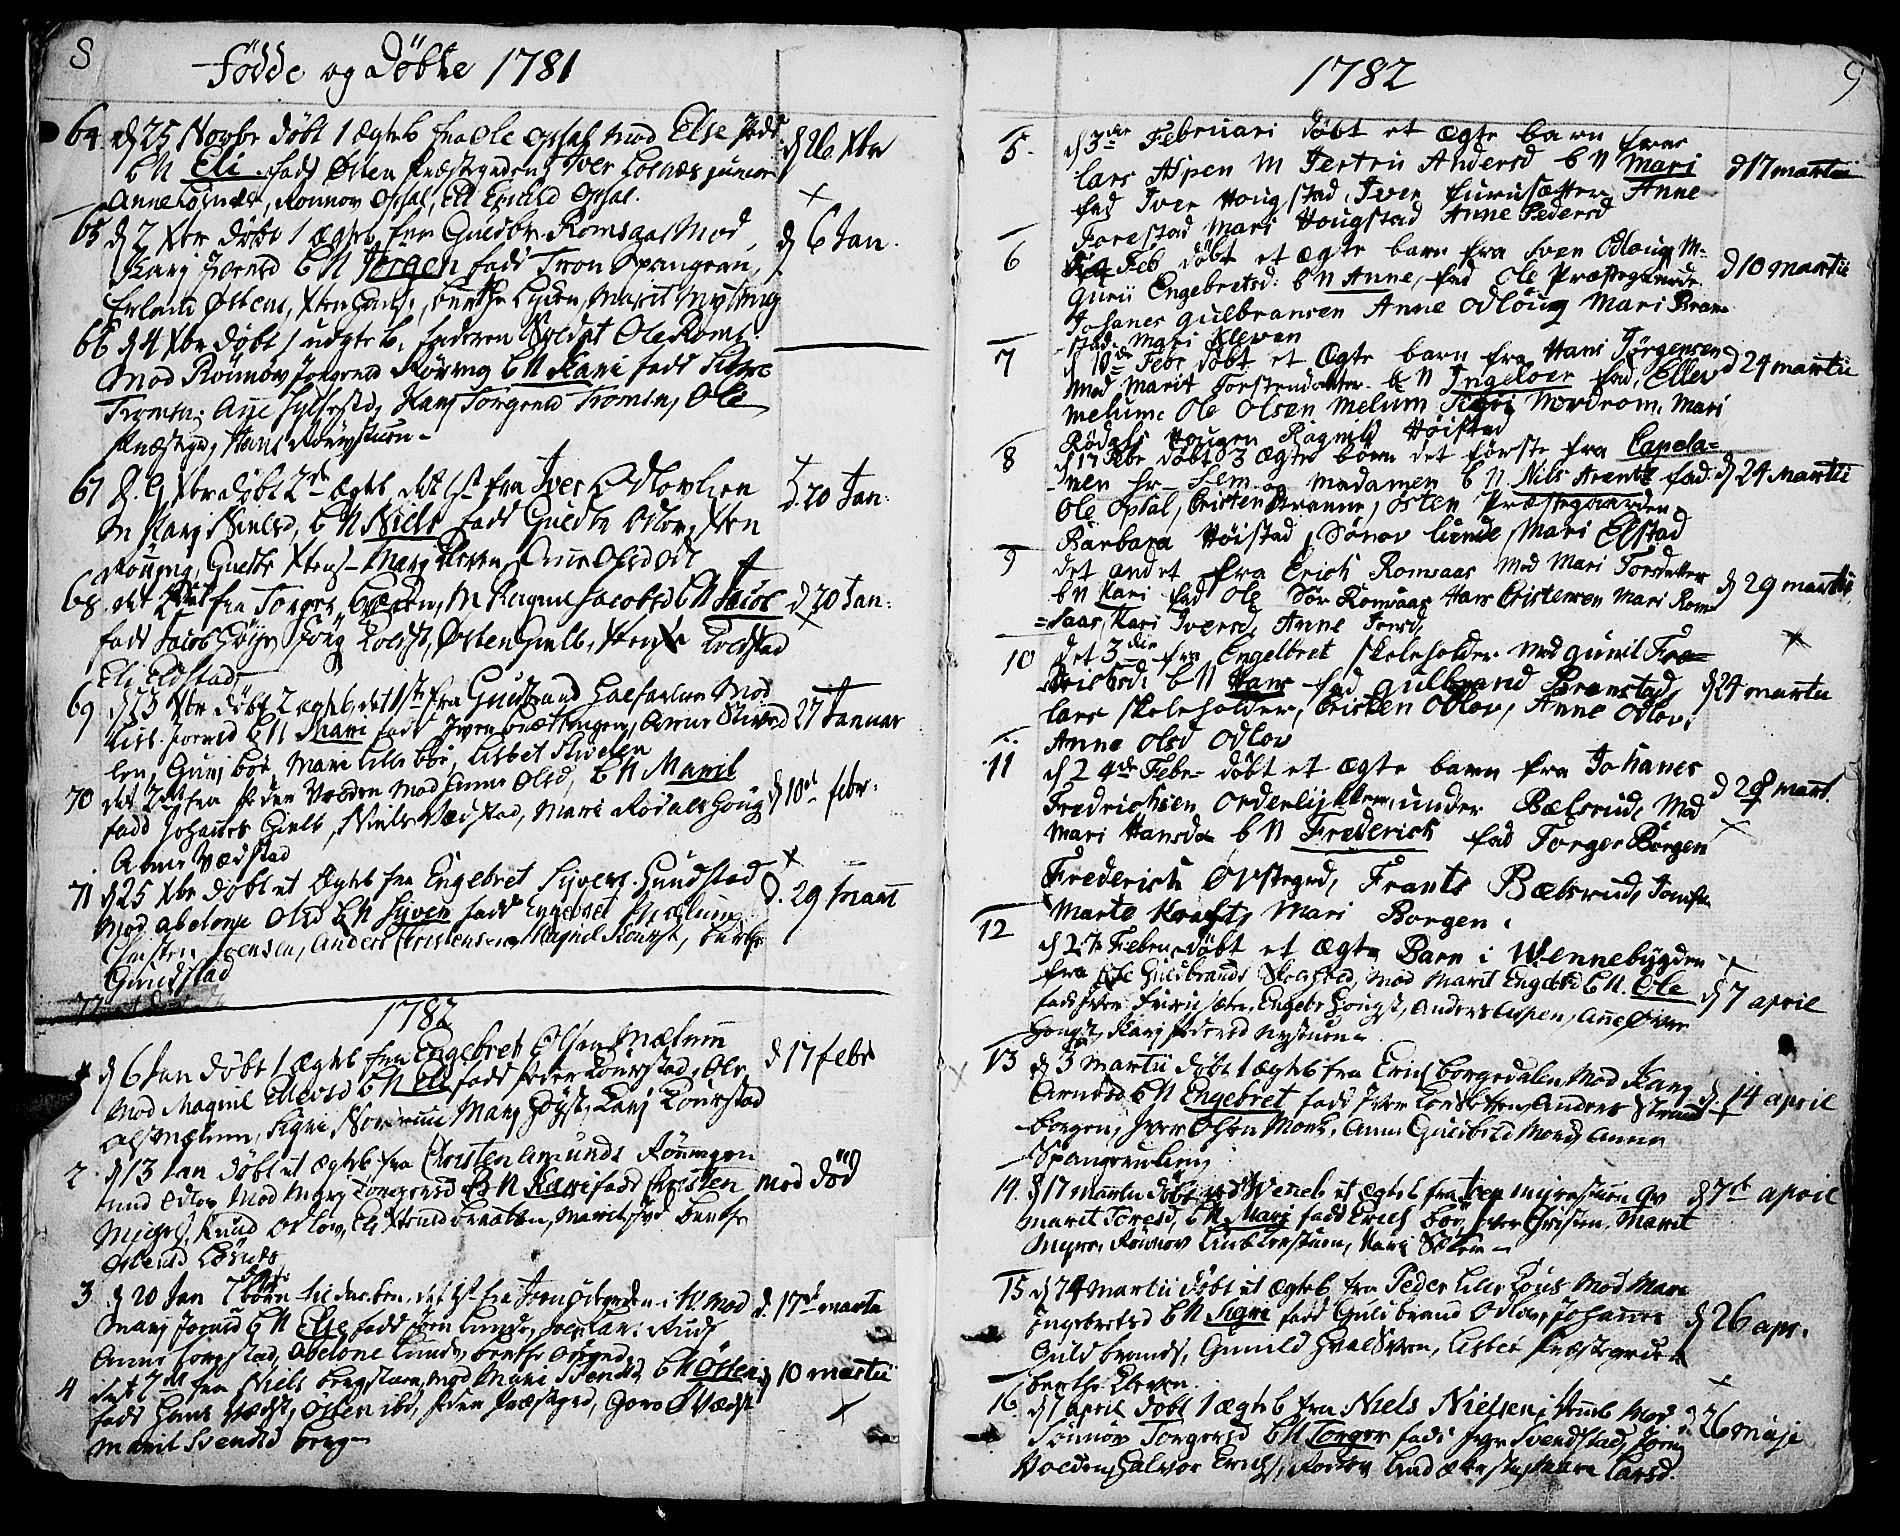 SAH, Ringebu prestekontor, Ministerialbok nr. 3, 1781-1820, s. 8-9